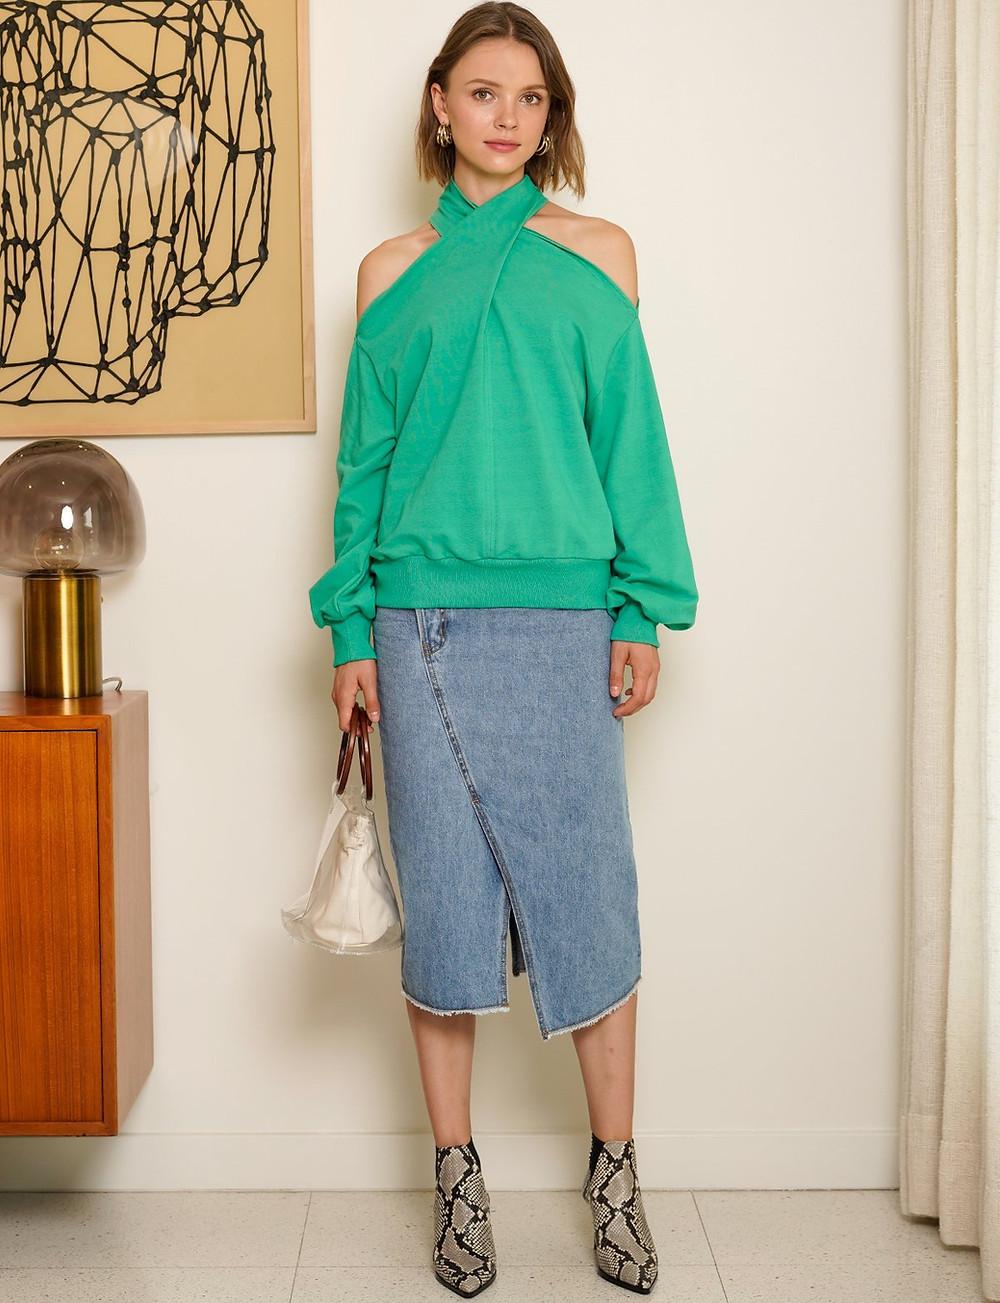 Pixie Market Nico Mint Green Sweatshirt $96